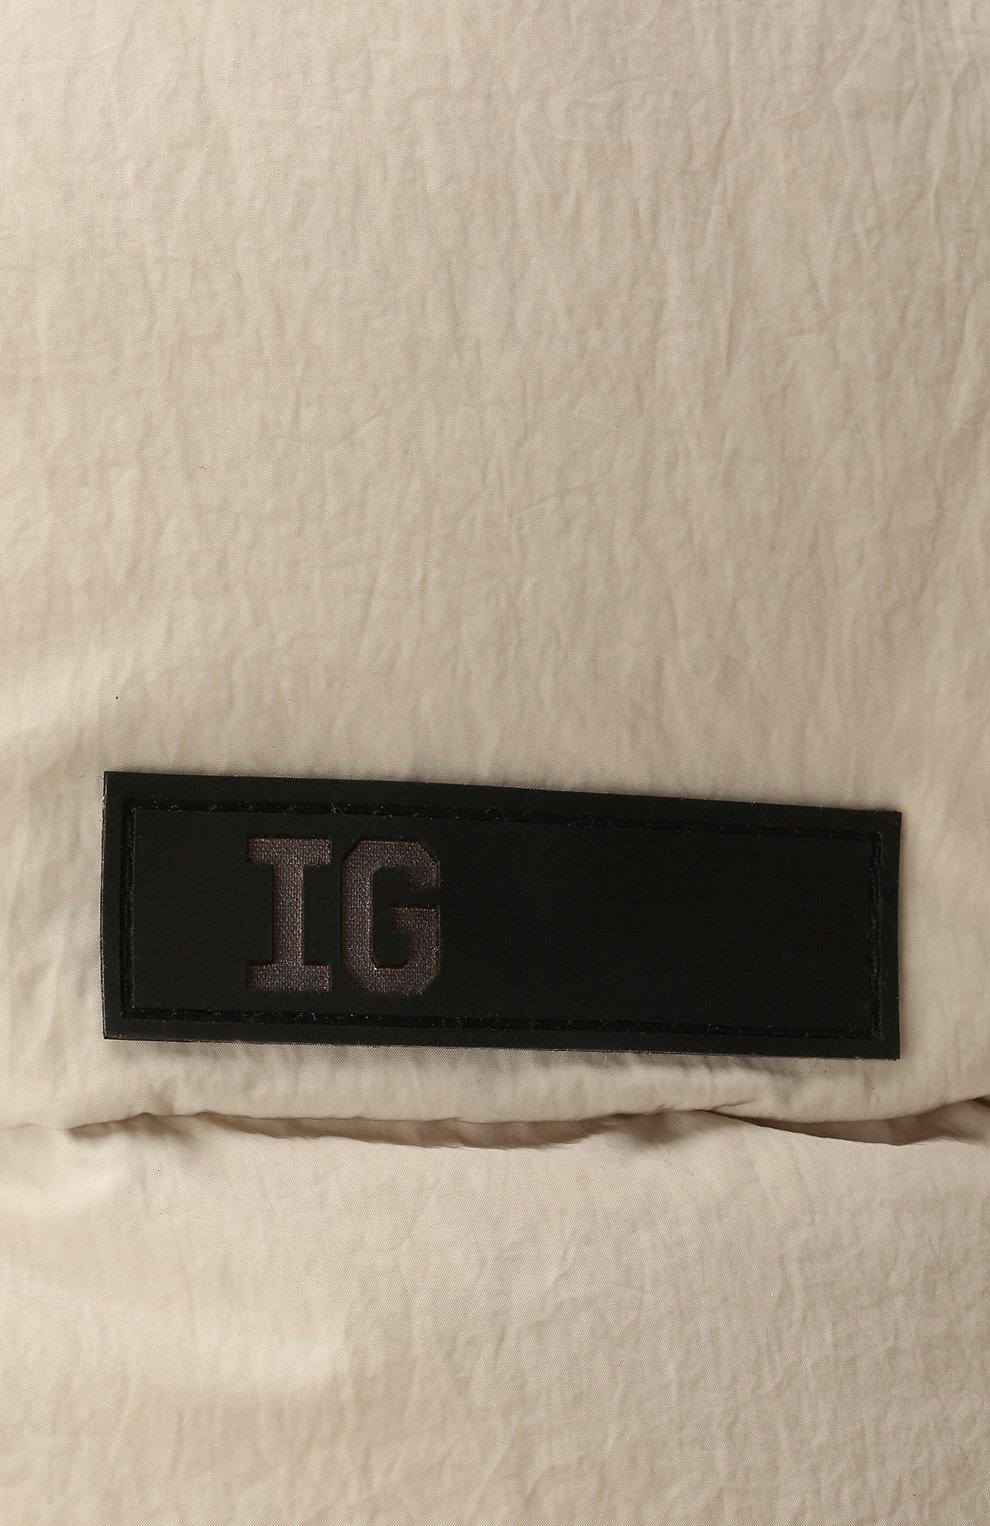 Детского утепленная шапка-ушанка IL GUFO серого цвета, арт. A21E0219N0072 | Фото 3 (Материал: Текстиль, Синтетический материал)